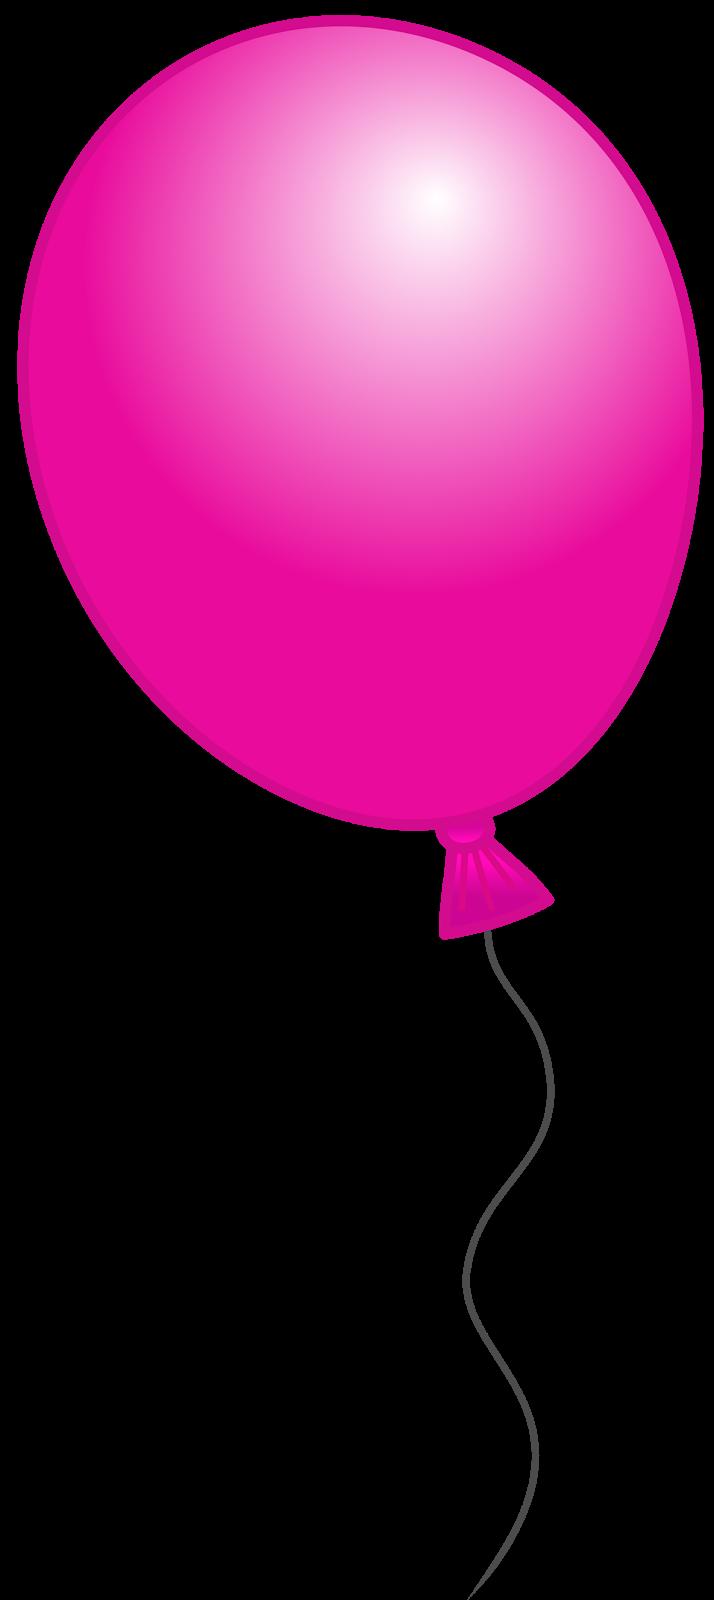 Treasures balloons you can. Clipart birthday classroom